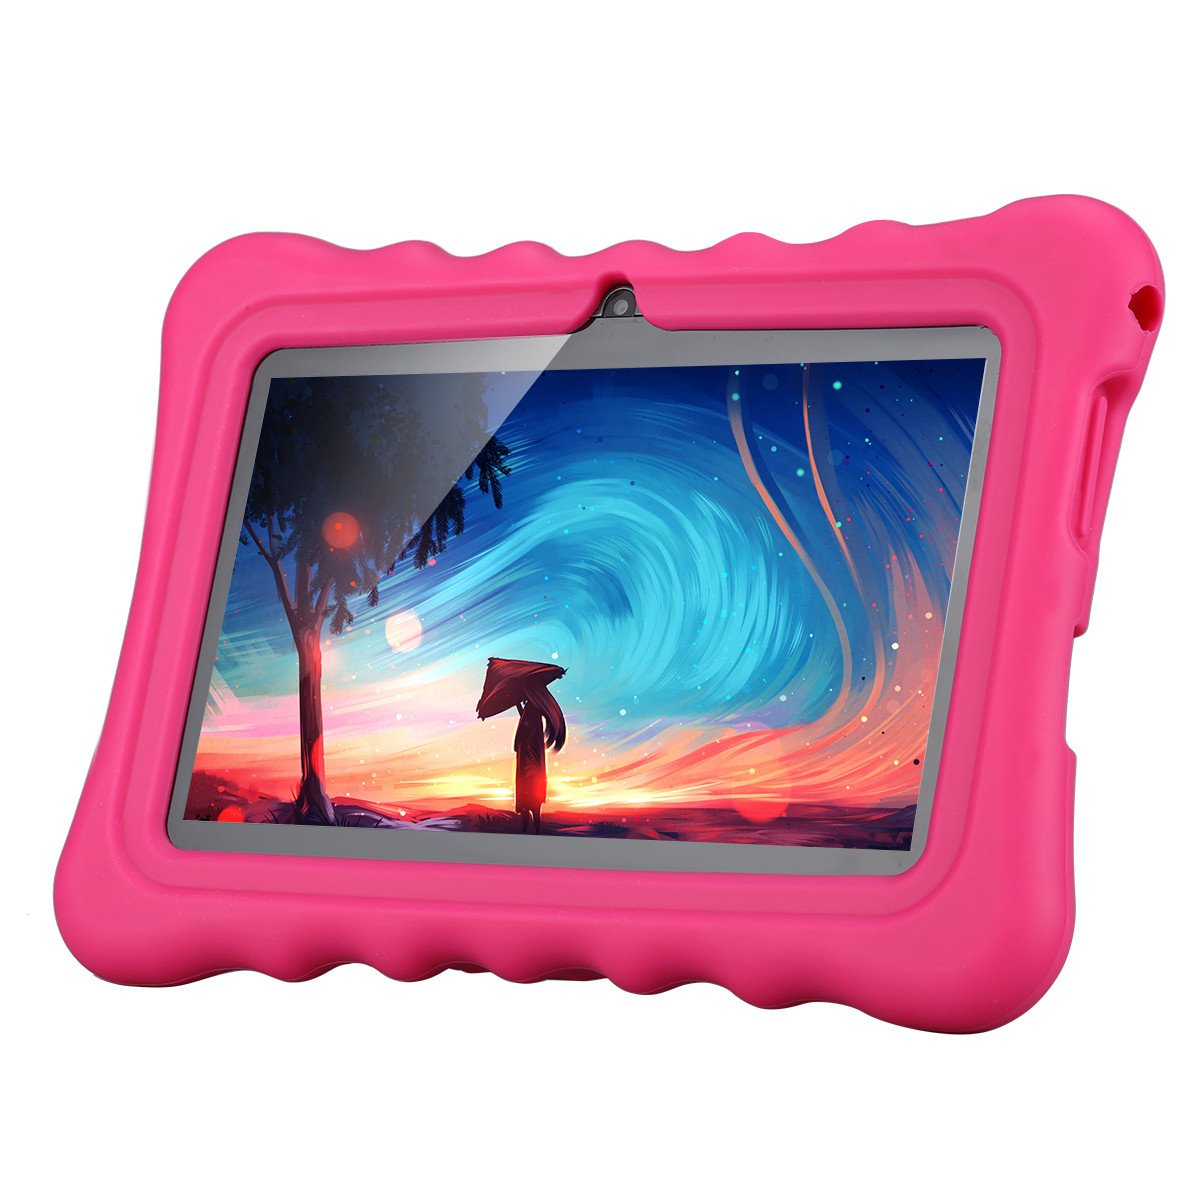 Ainol Q88 Android 7.1 RK3126C Quad Core 1GB+16GB 0.3MP+0.3MP Cam WiFi 2800Ah Tablet PC--Pink